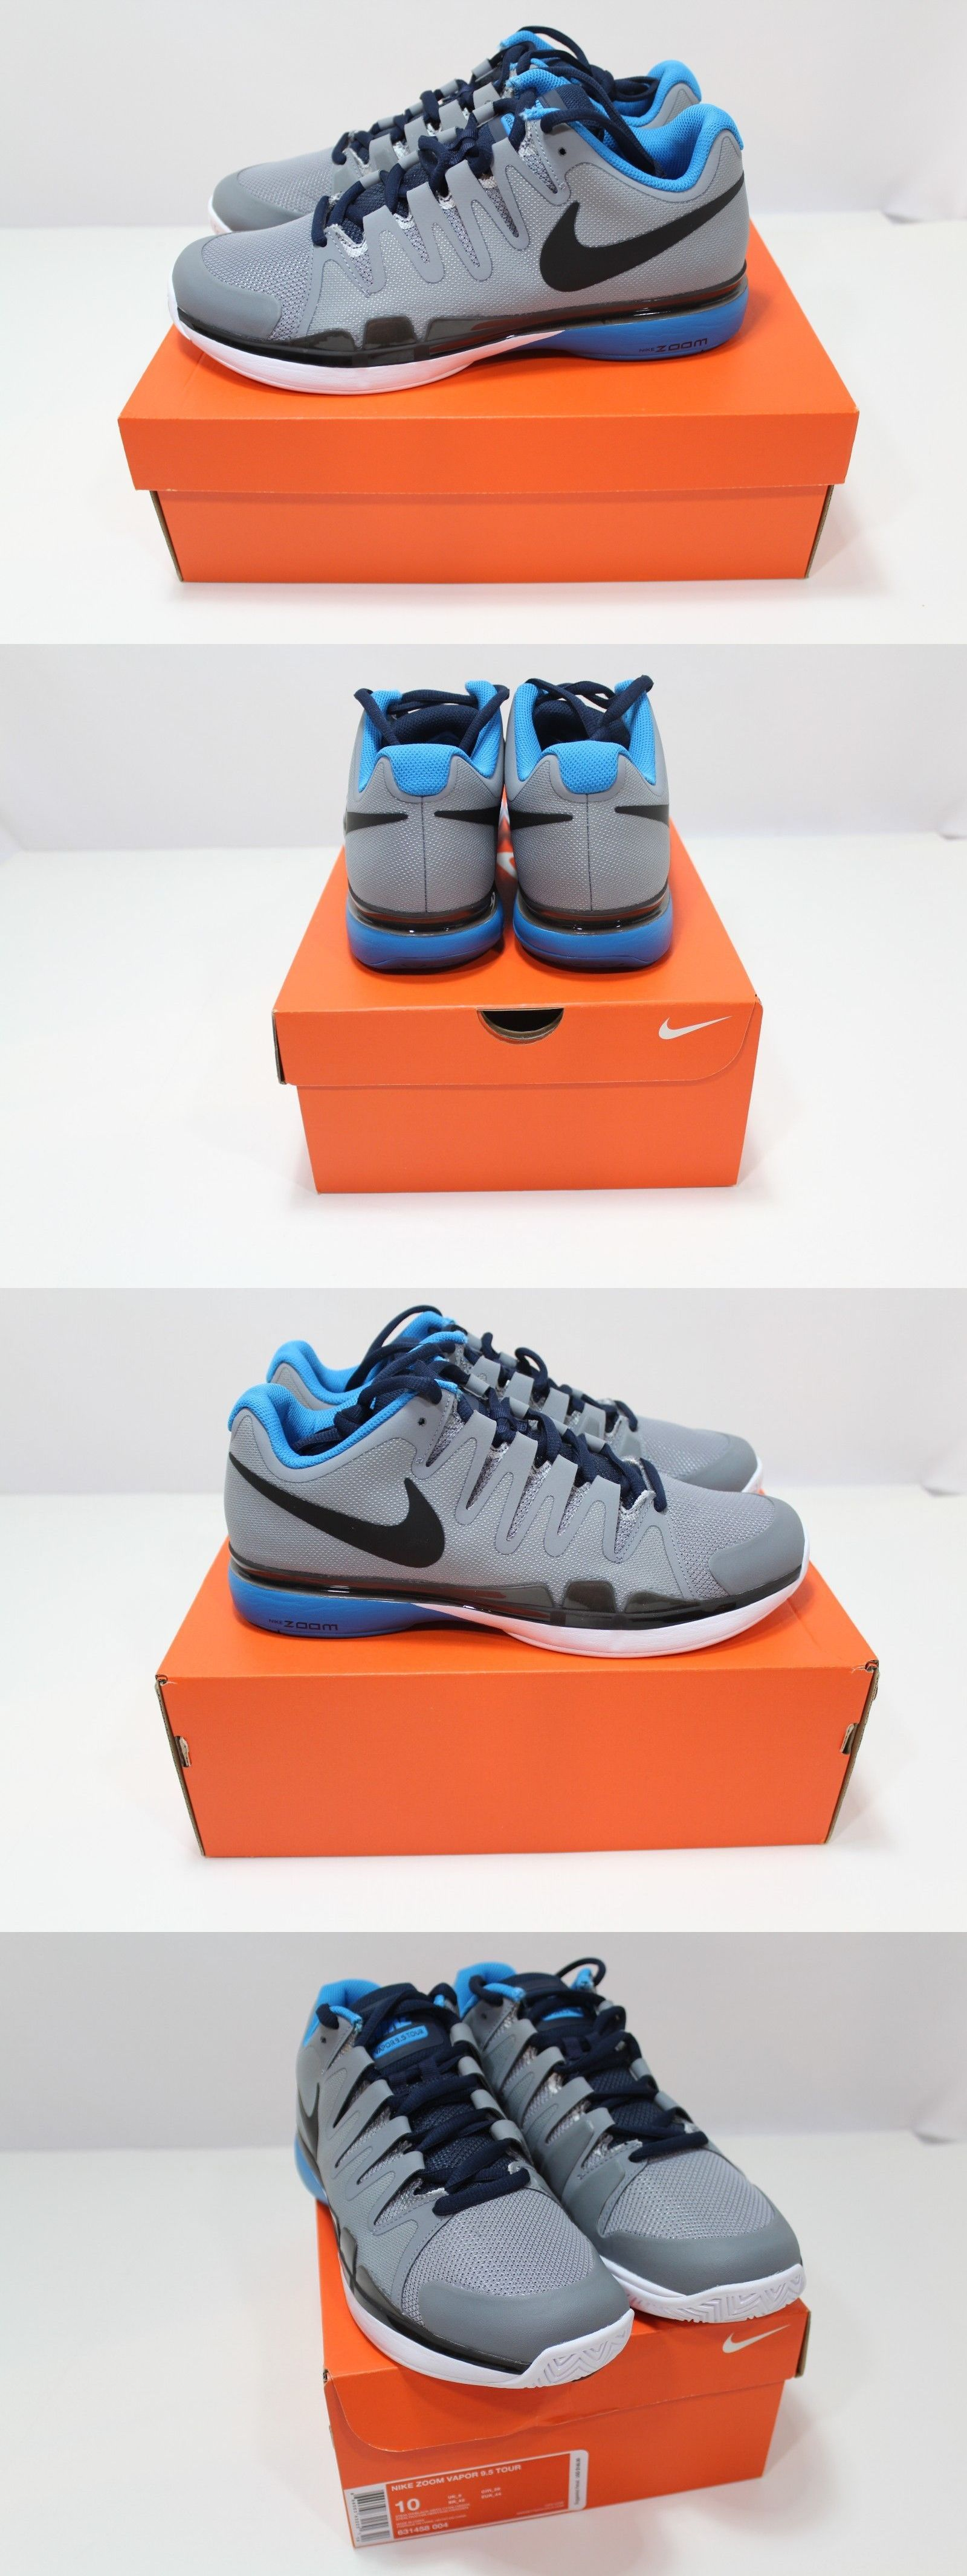 sports shoes d7256 f73ae Shoes 62230  New Men S Zoom Nike Vapor 9.5 Tour Tennis Shoes Size 10 Style